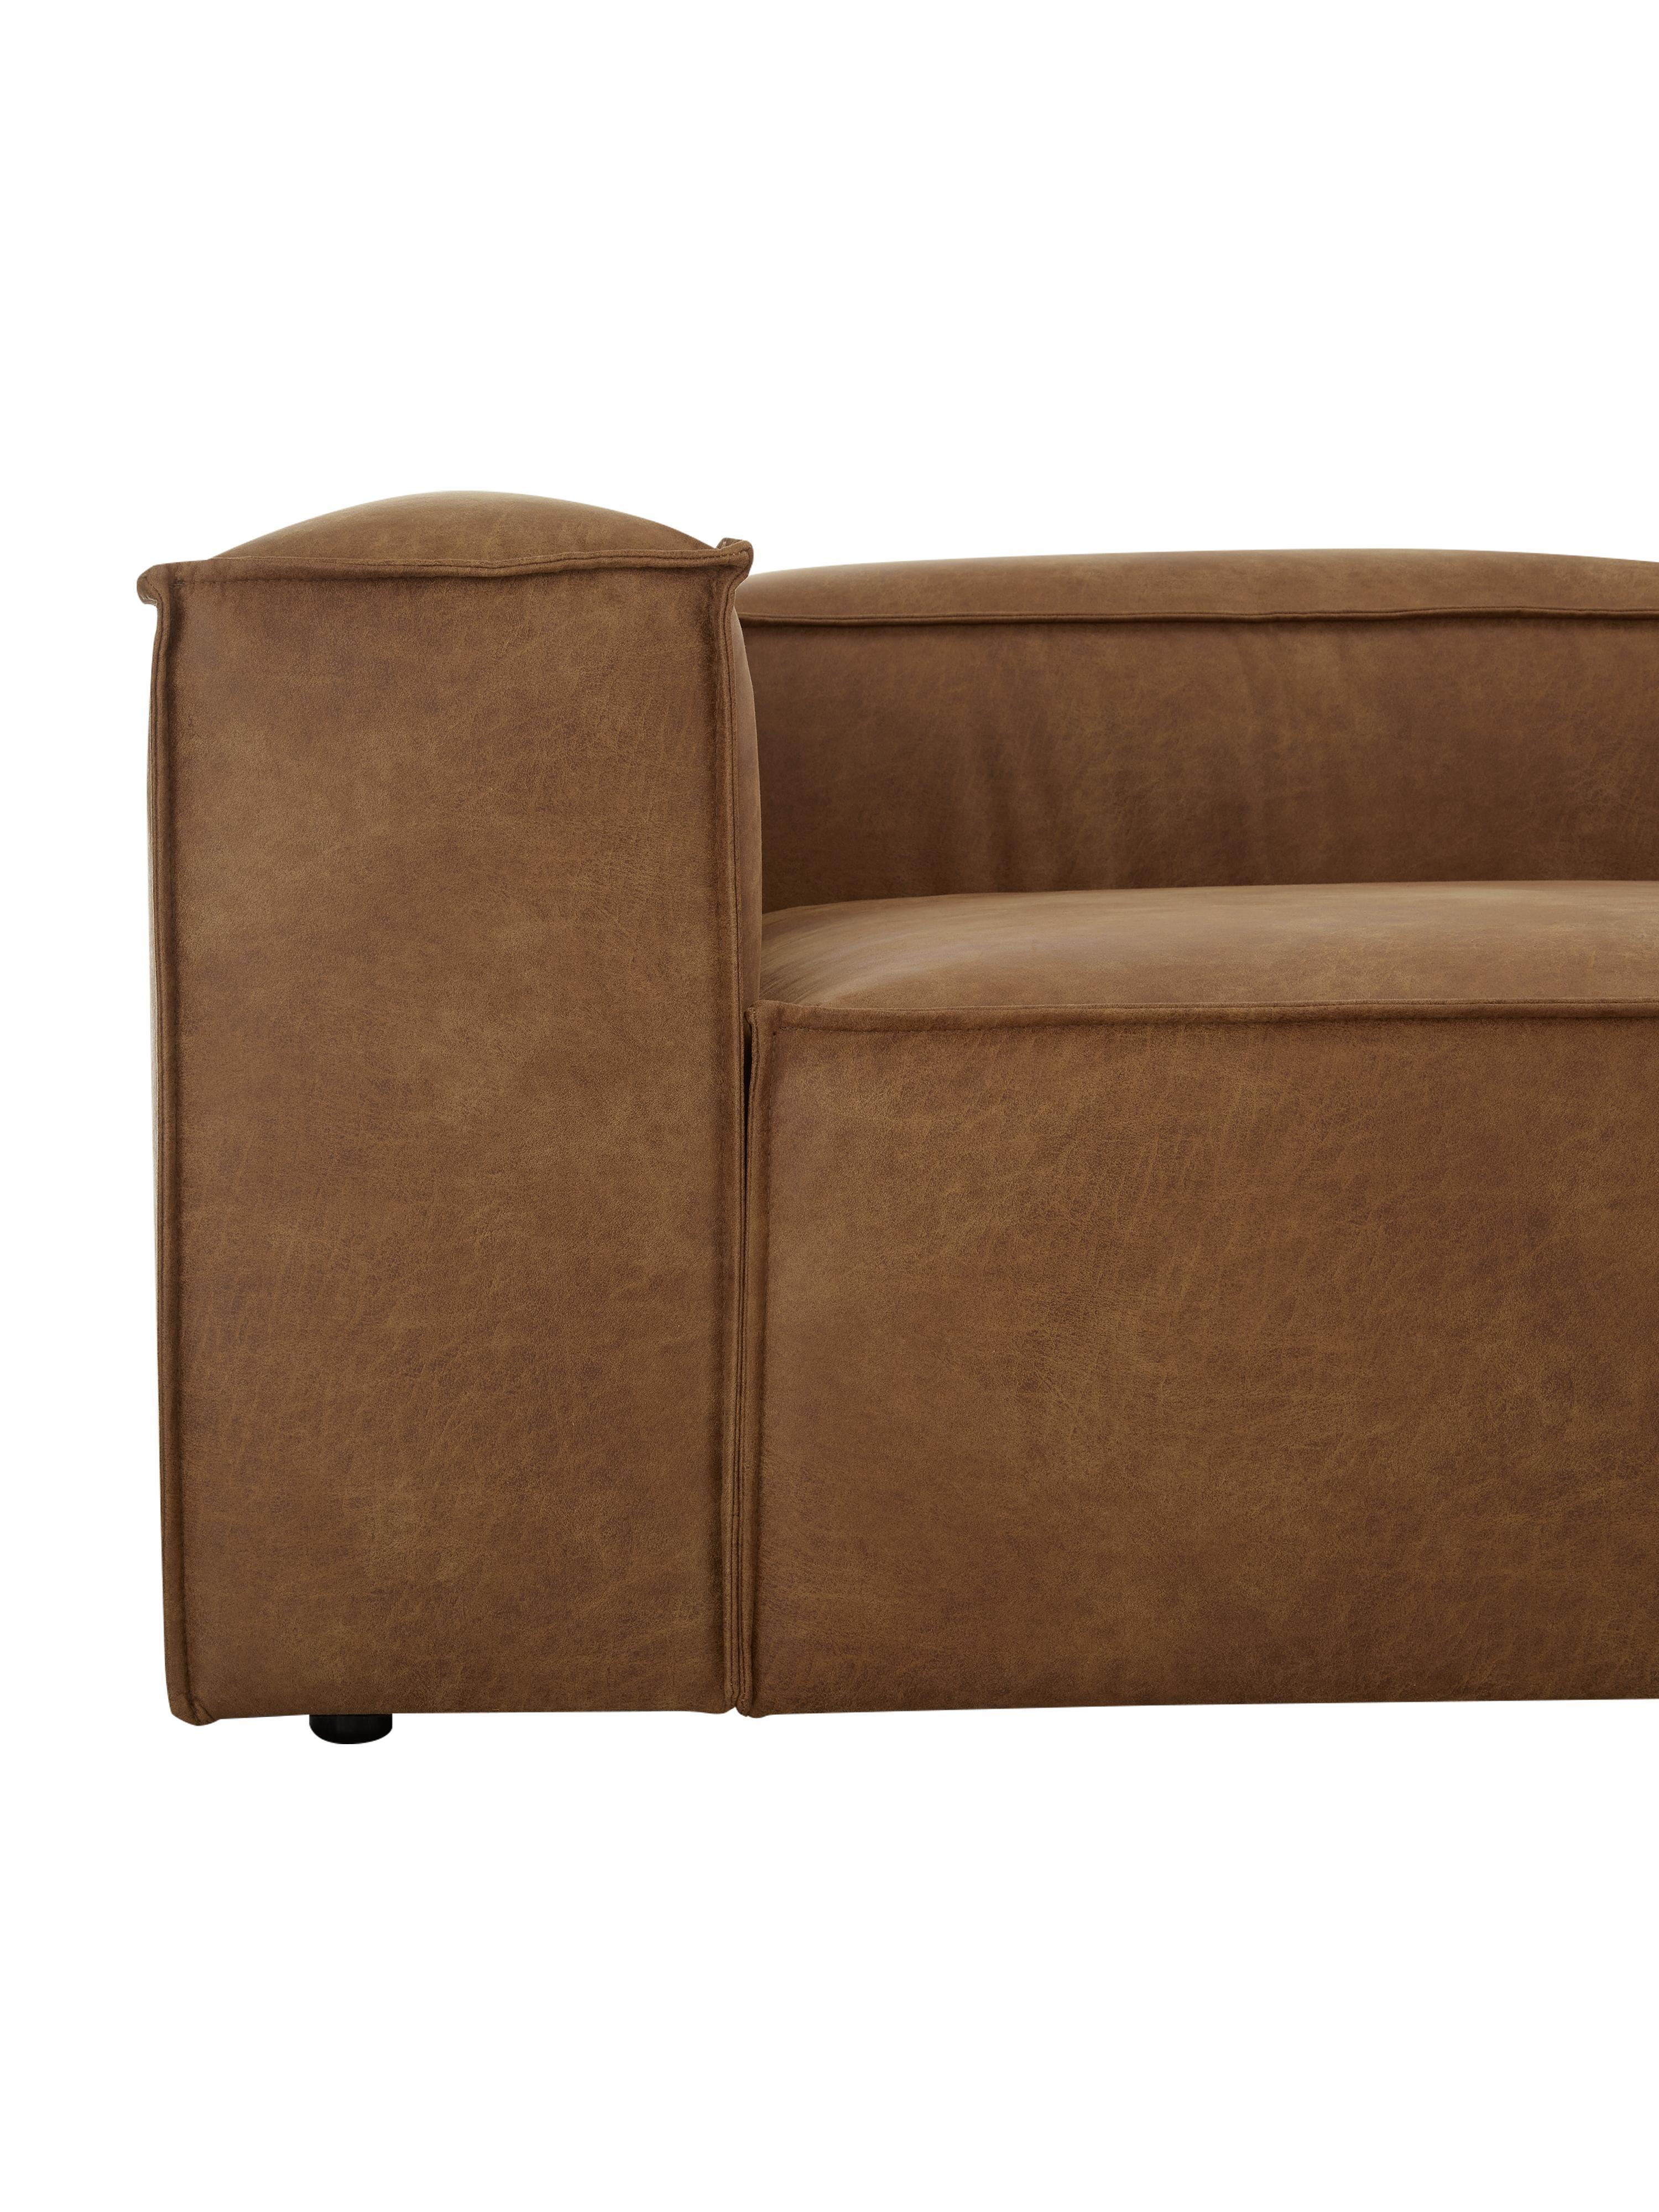 Modulares Leder-Sofa Lennon (3-Sitzer), Bezug: 70% Leder, 30% Polyester , Gestell: Massives Kiefernholz, Spe, Füße: Kunststoff, Leder Braun, B 238 x T 119 cm